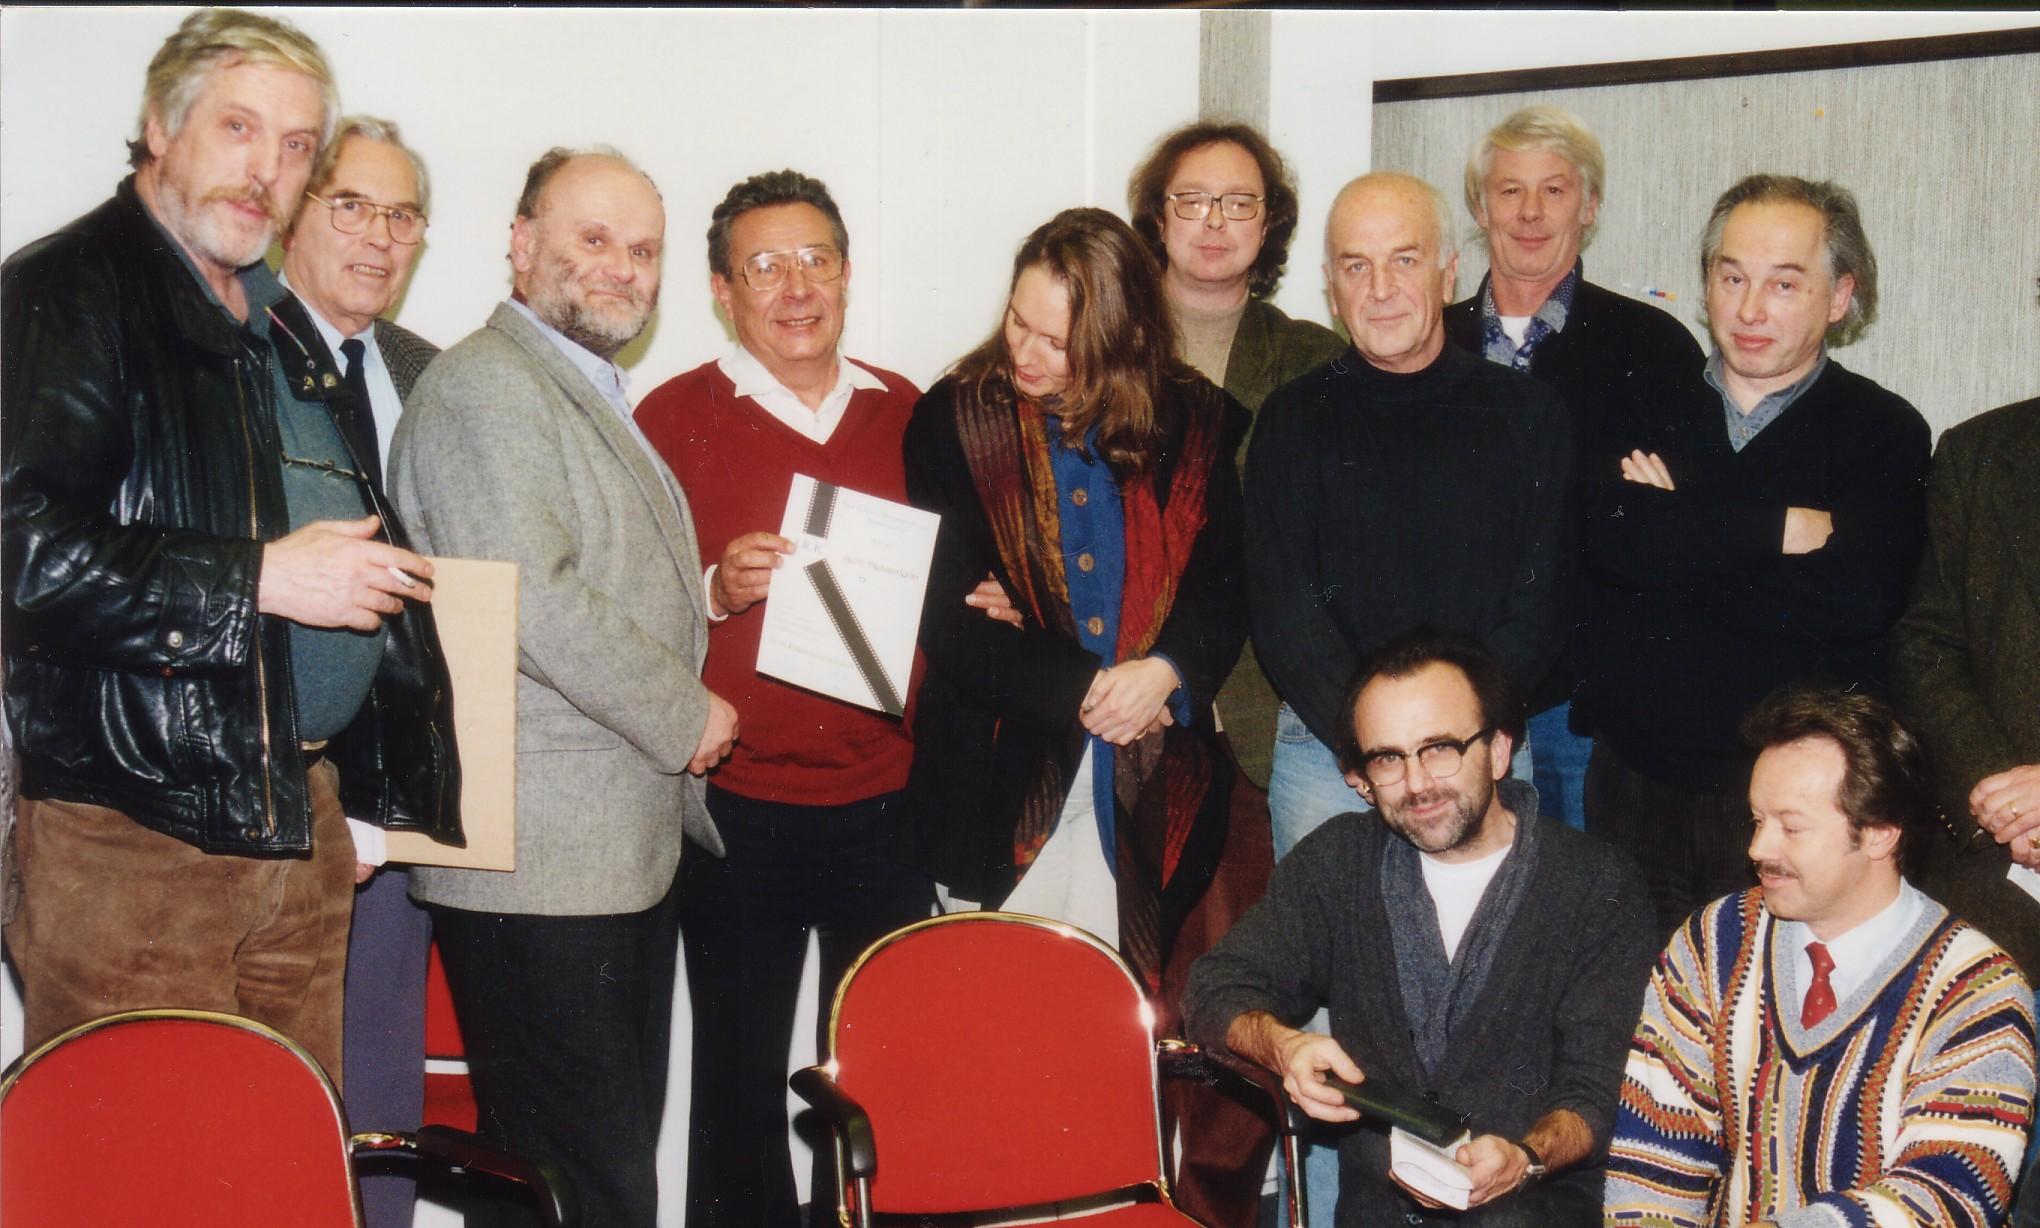 Ehrenmitgliedschaft an Heinz Brossmann